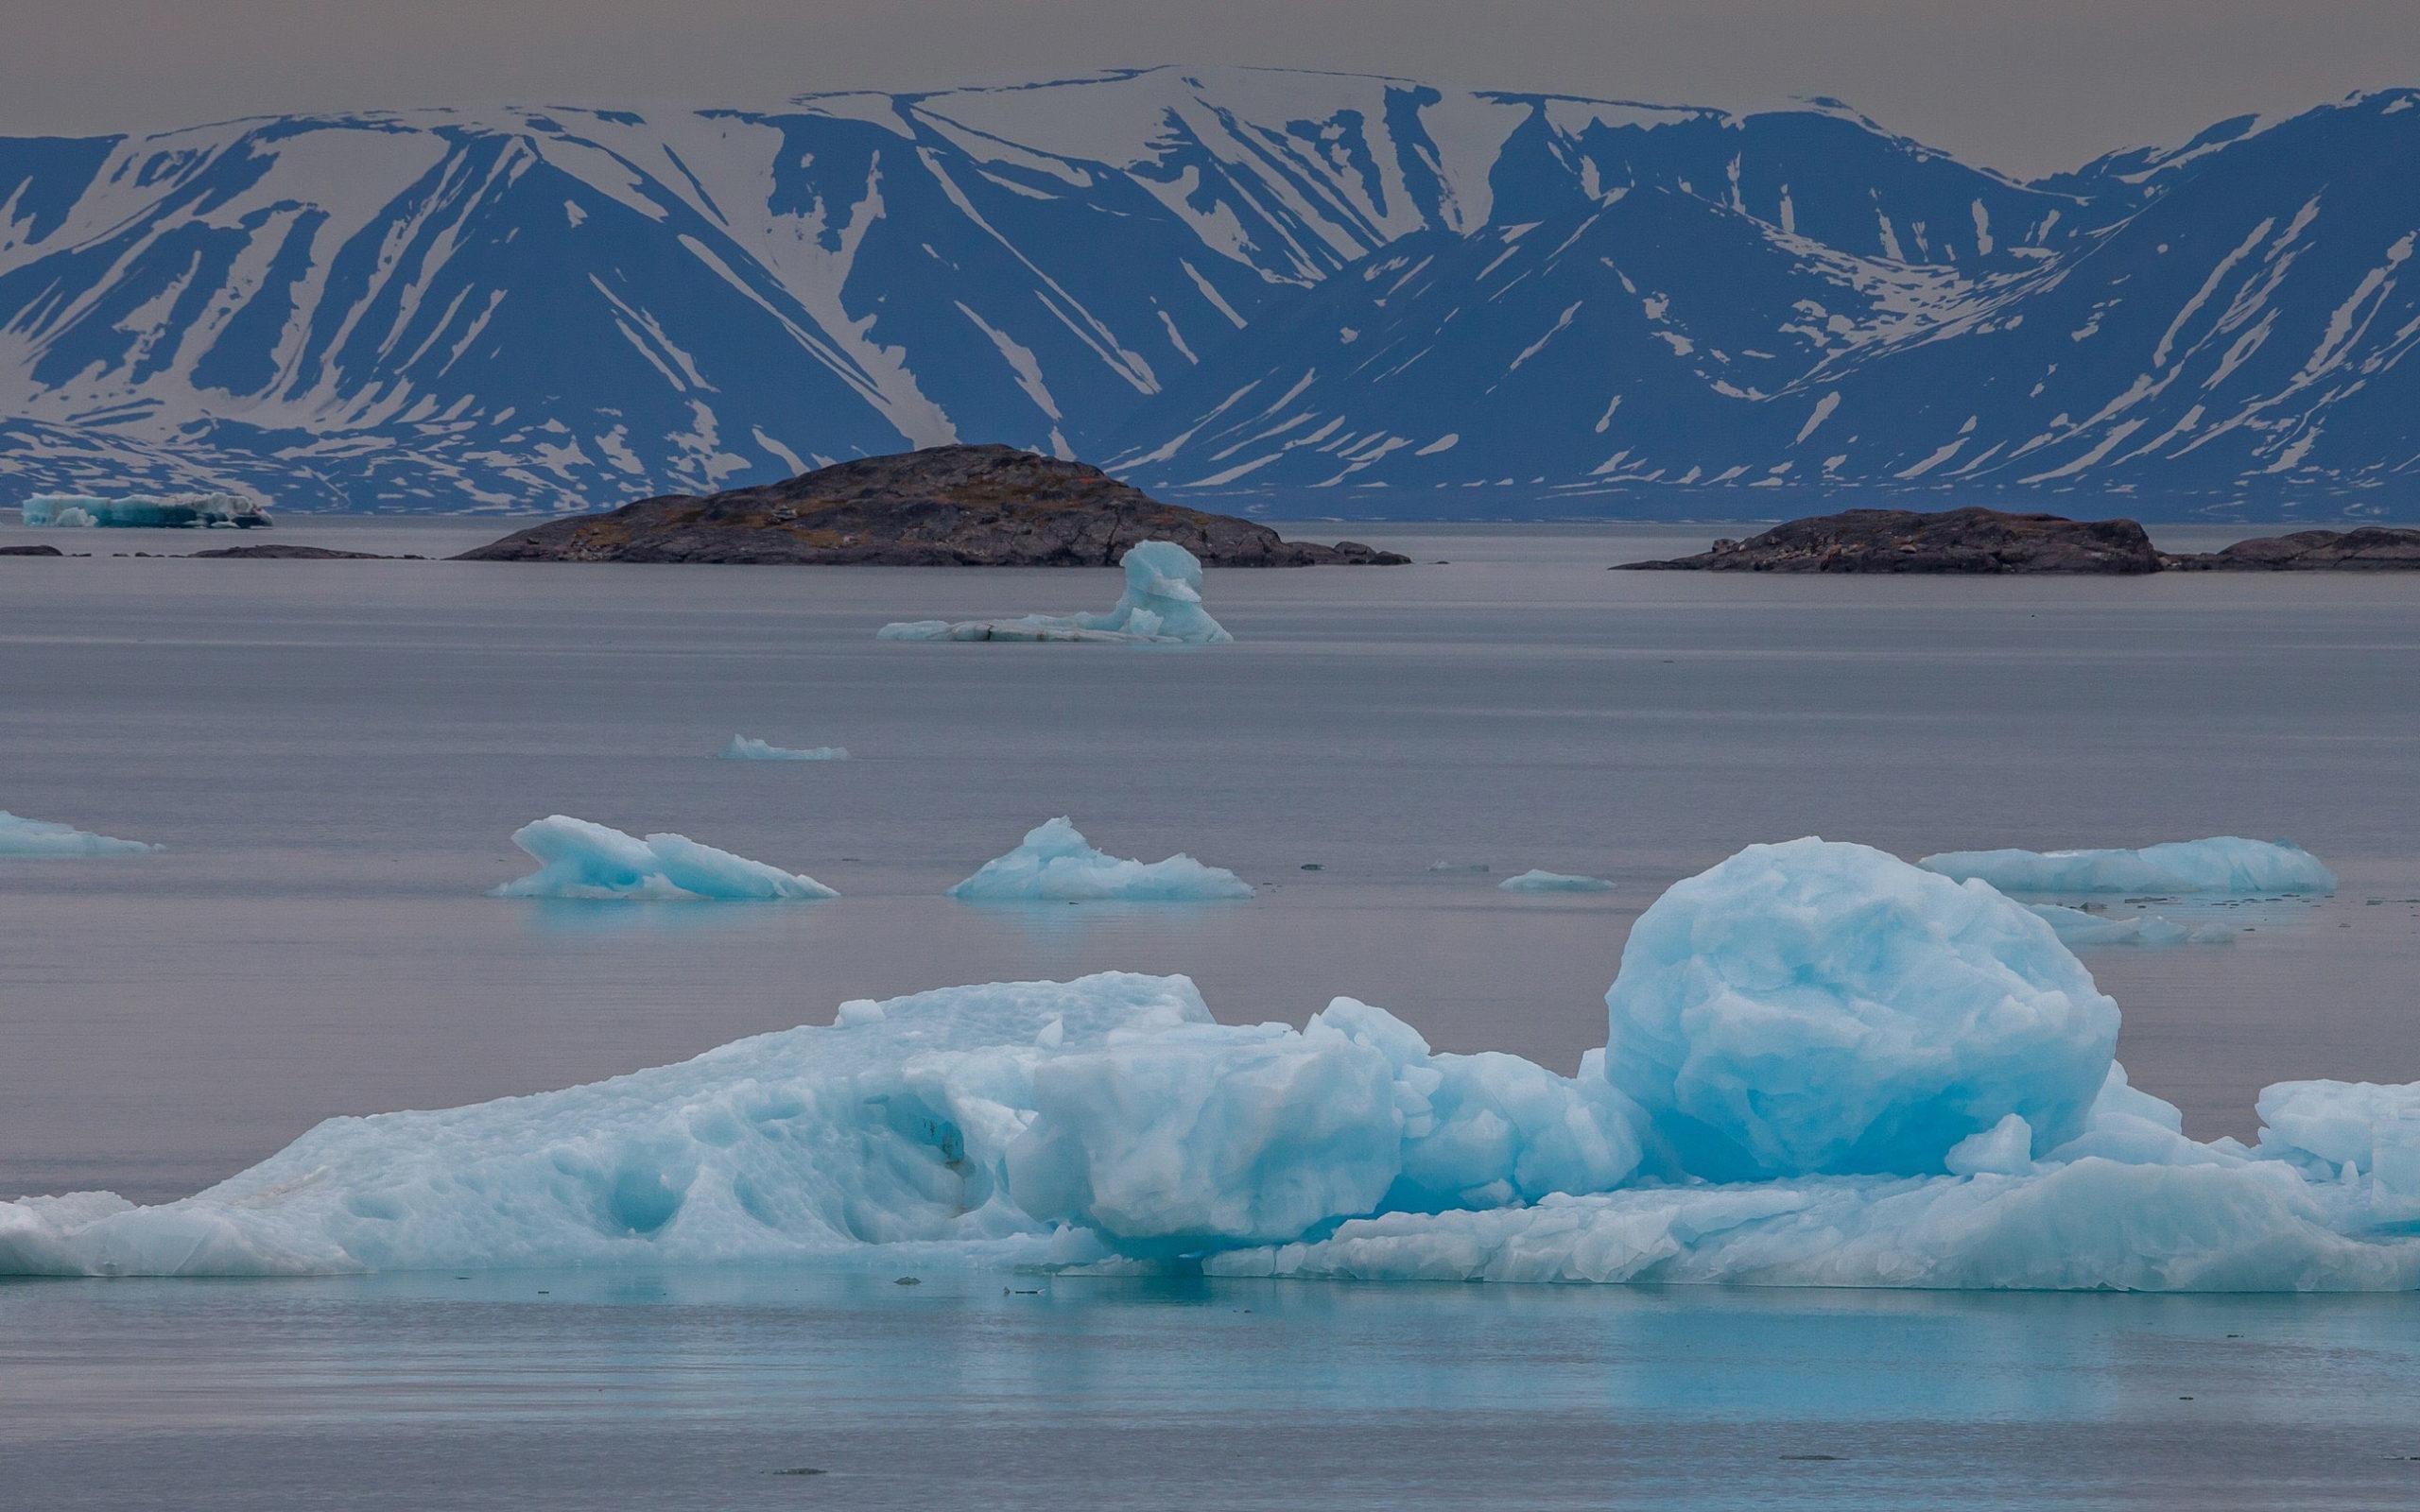 Nord-Ost-Passage (Franz-Josef-Land, Nowaja Semlja, Sewernaja Semlja, Neusibirische Inseln, Wrangel Insel, Tschuktschen Halbinsel)